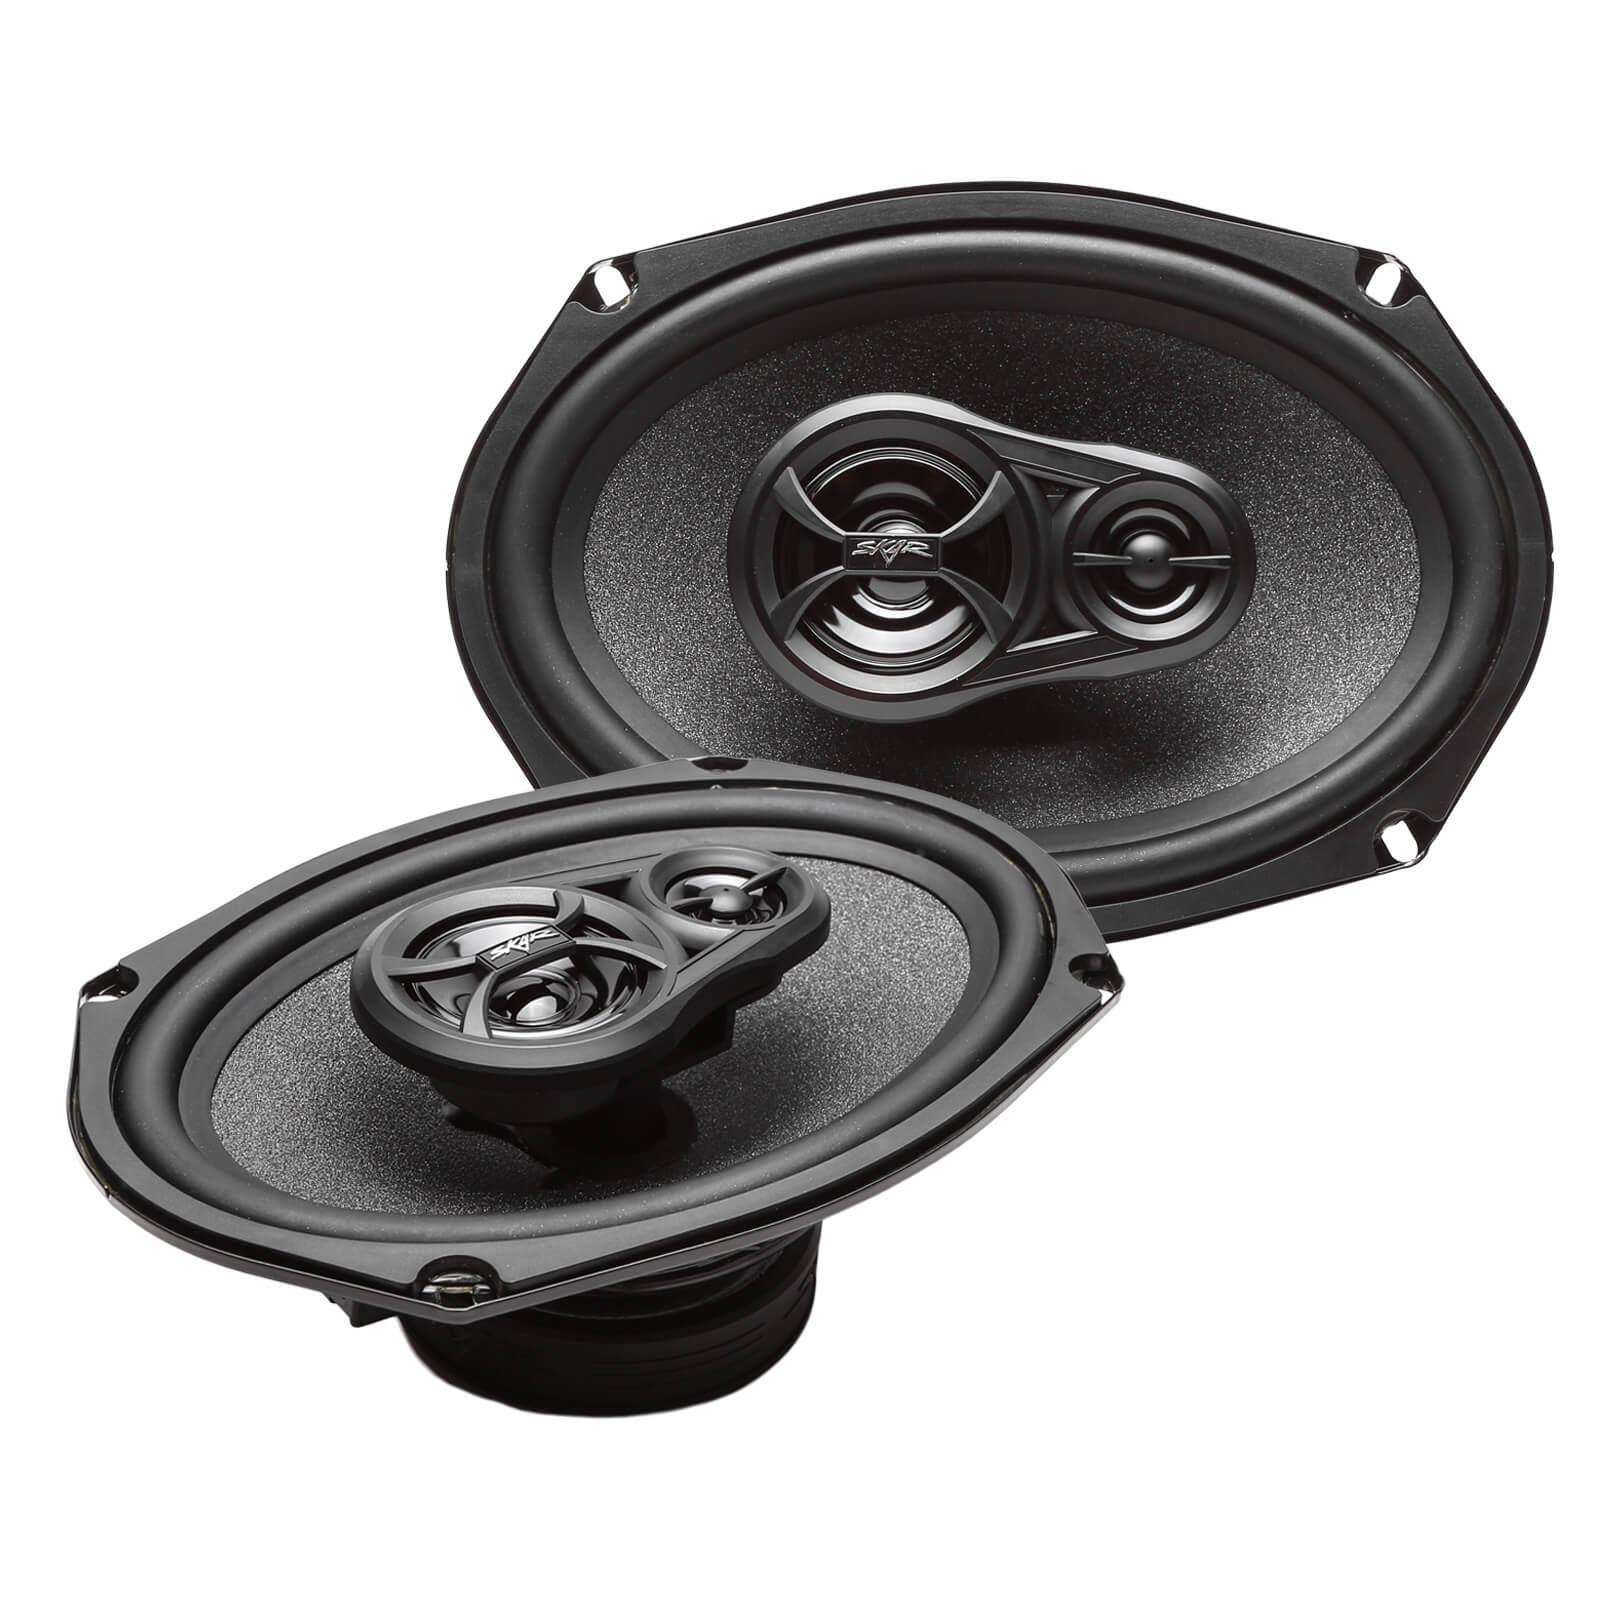 "Fits 1999-2001 Lexus ES 300 Front Door 6.5/"" RPX Speakers by Skar Audio"